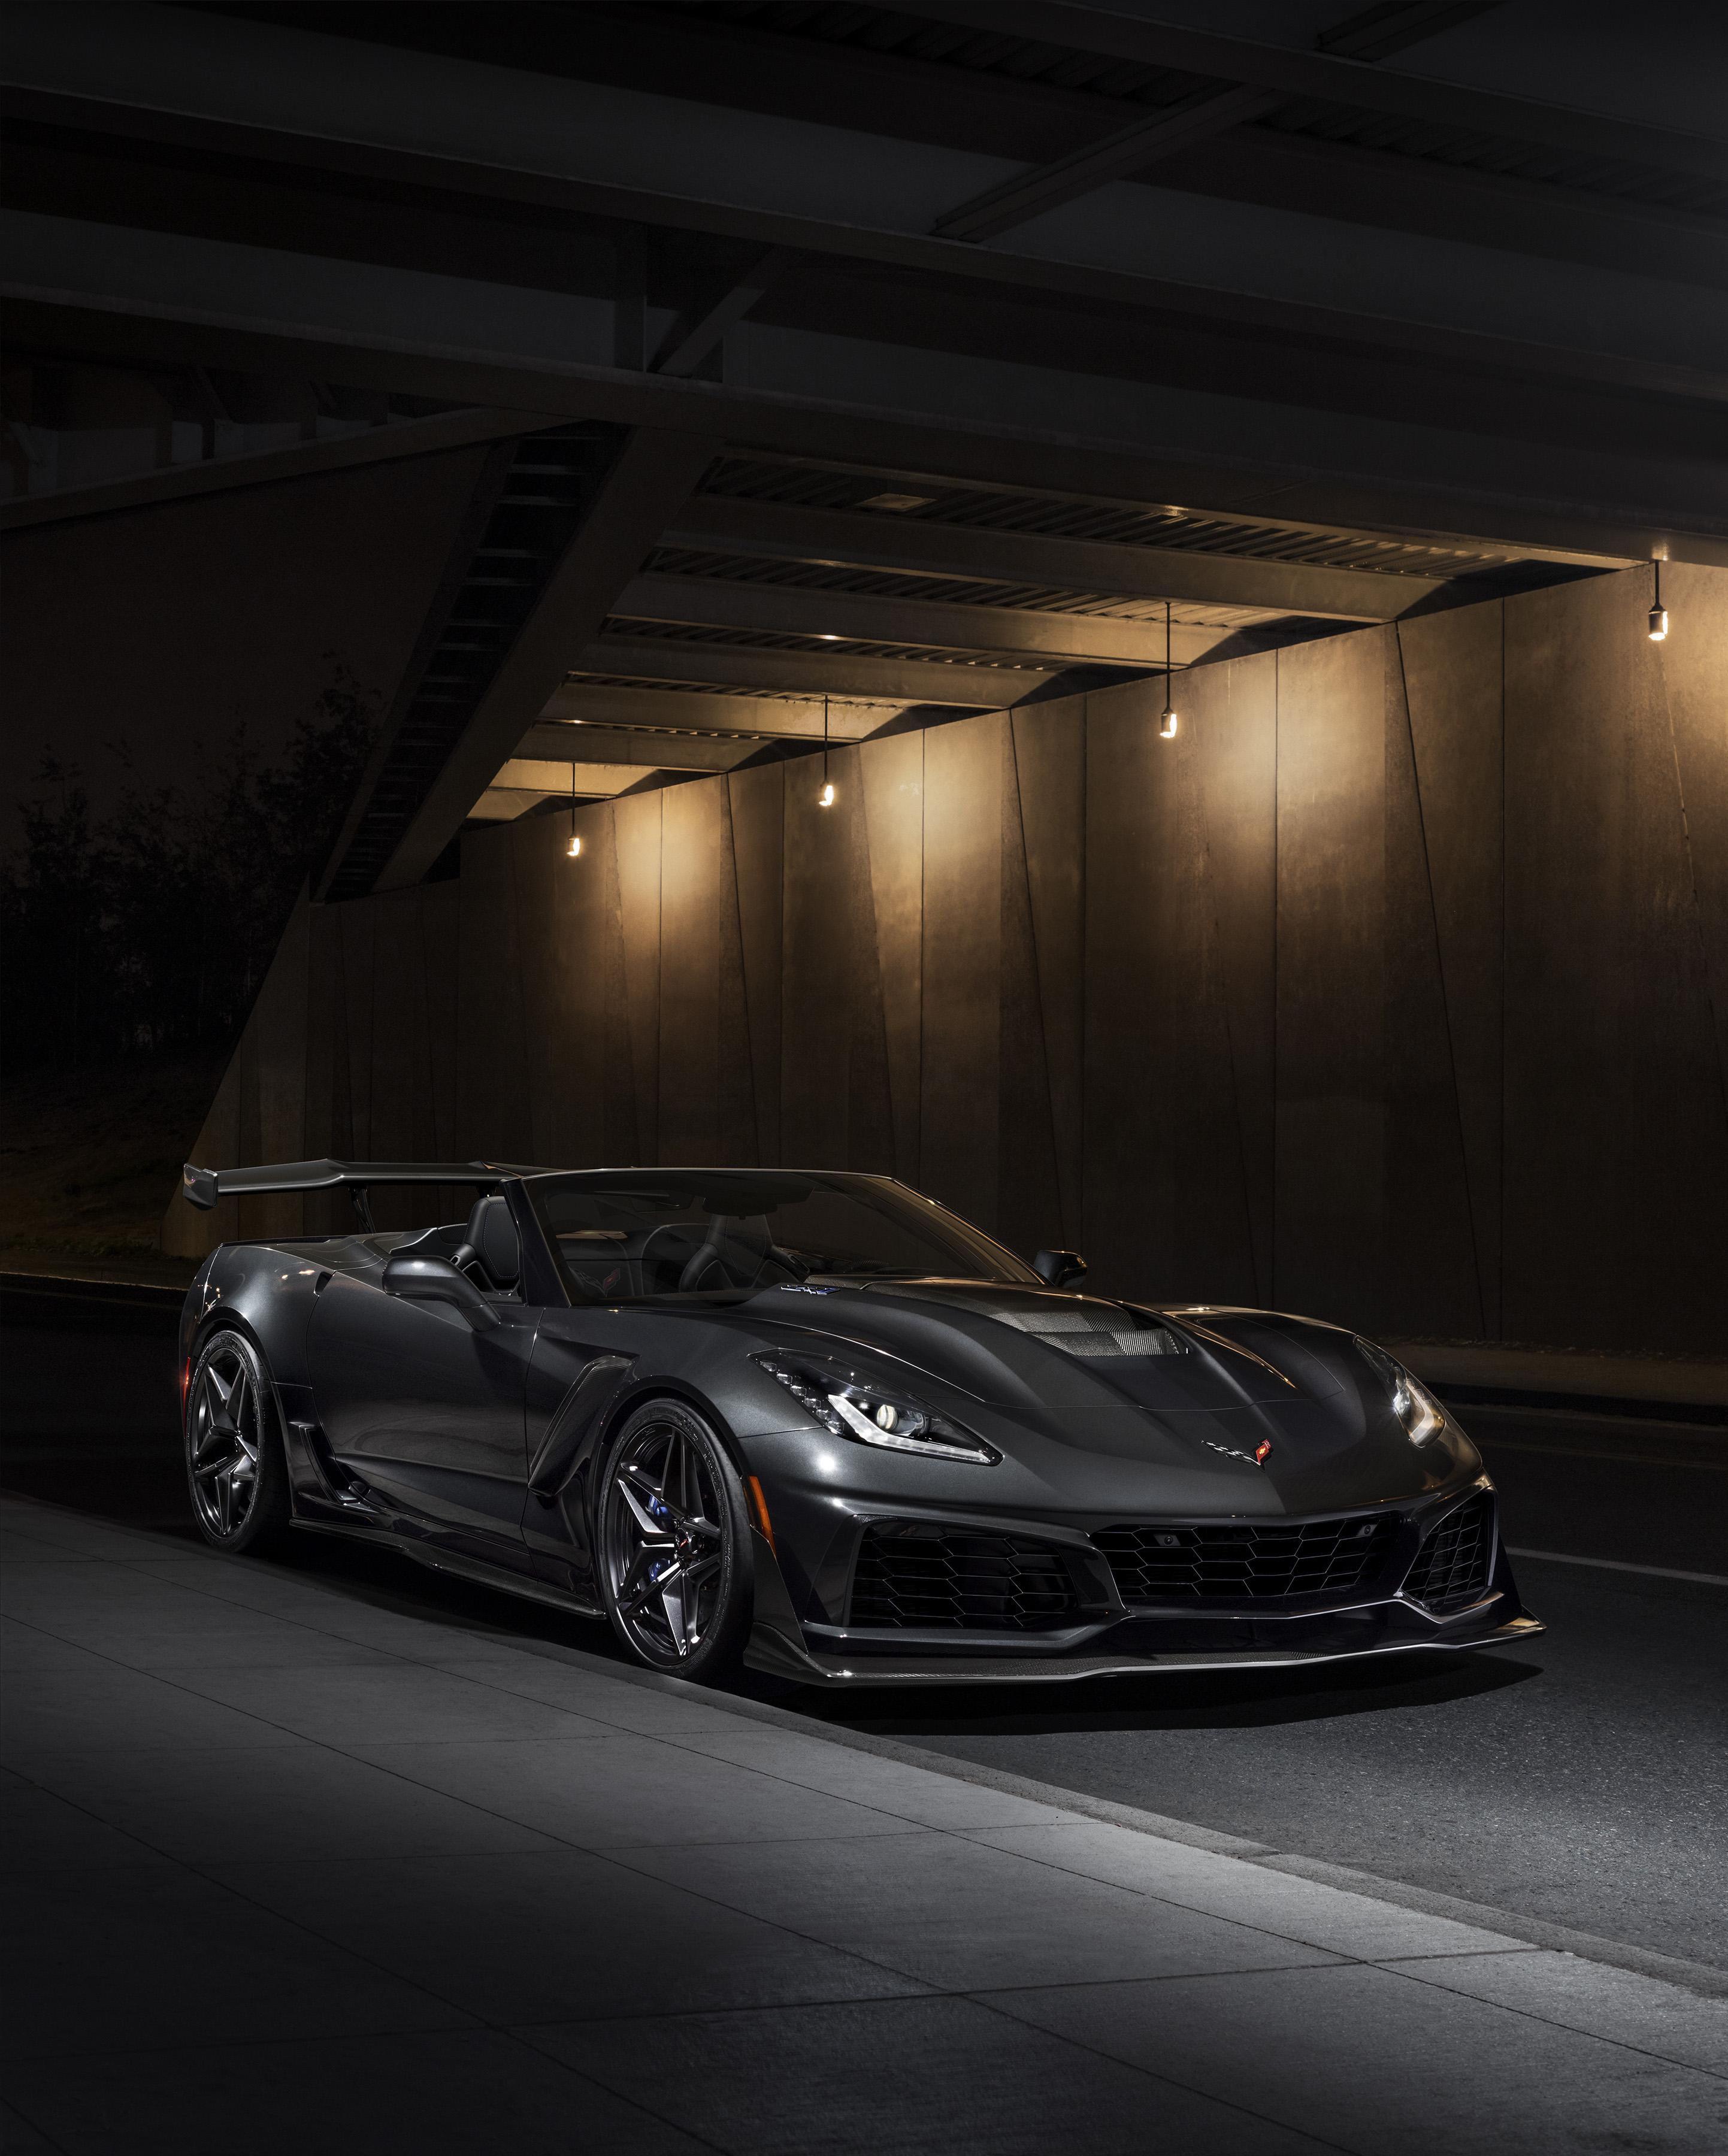 first modern era corvette zr1 convertible makes debut national corvette museum. Black Bedroom Furniture Sets. Home Design Ideas